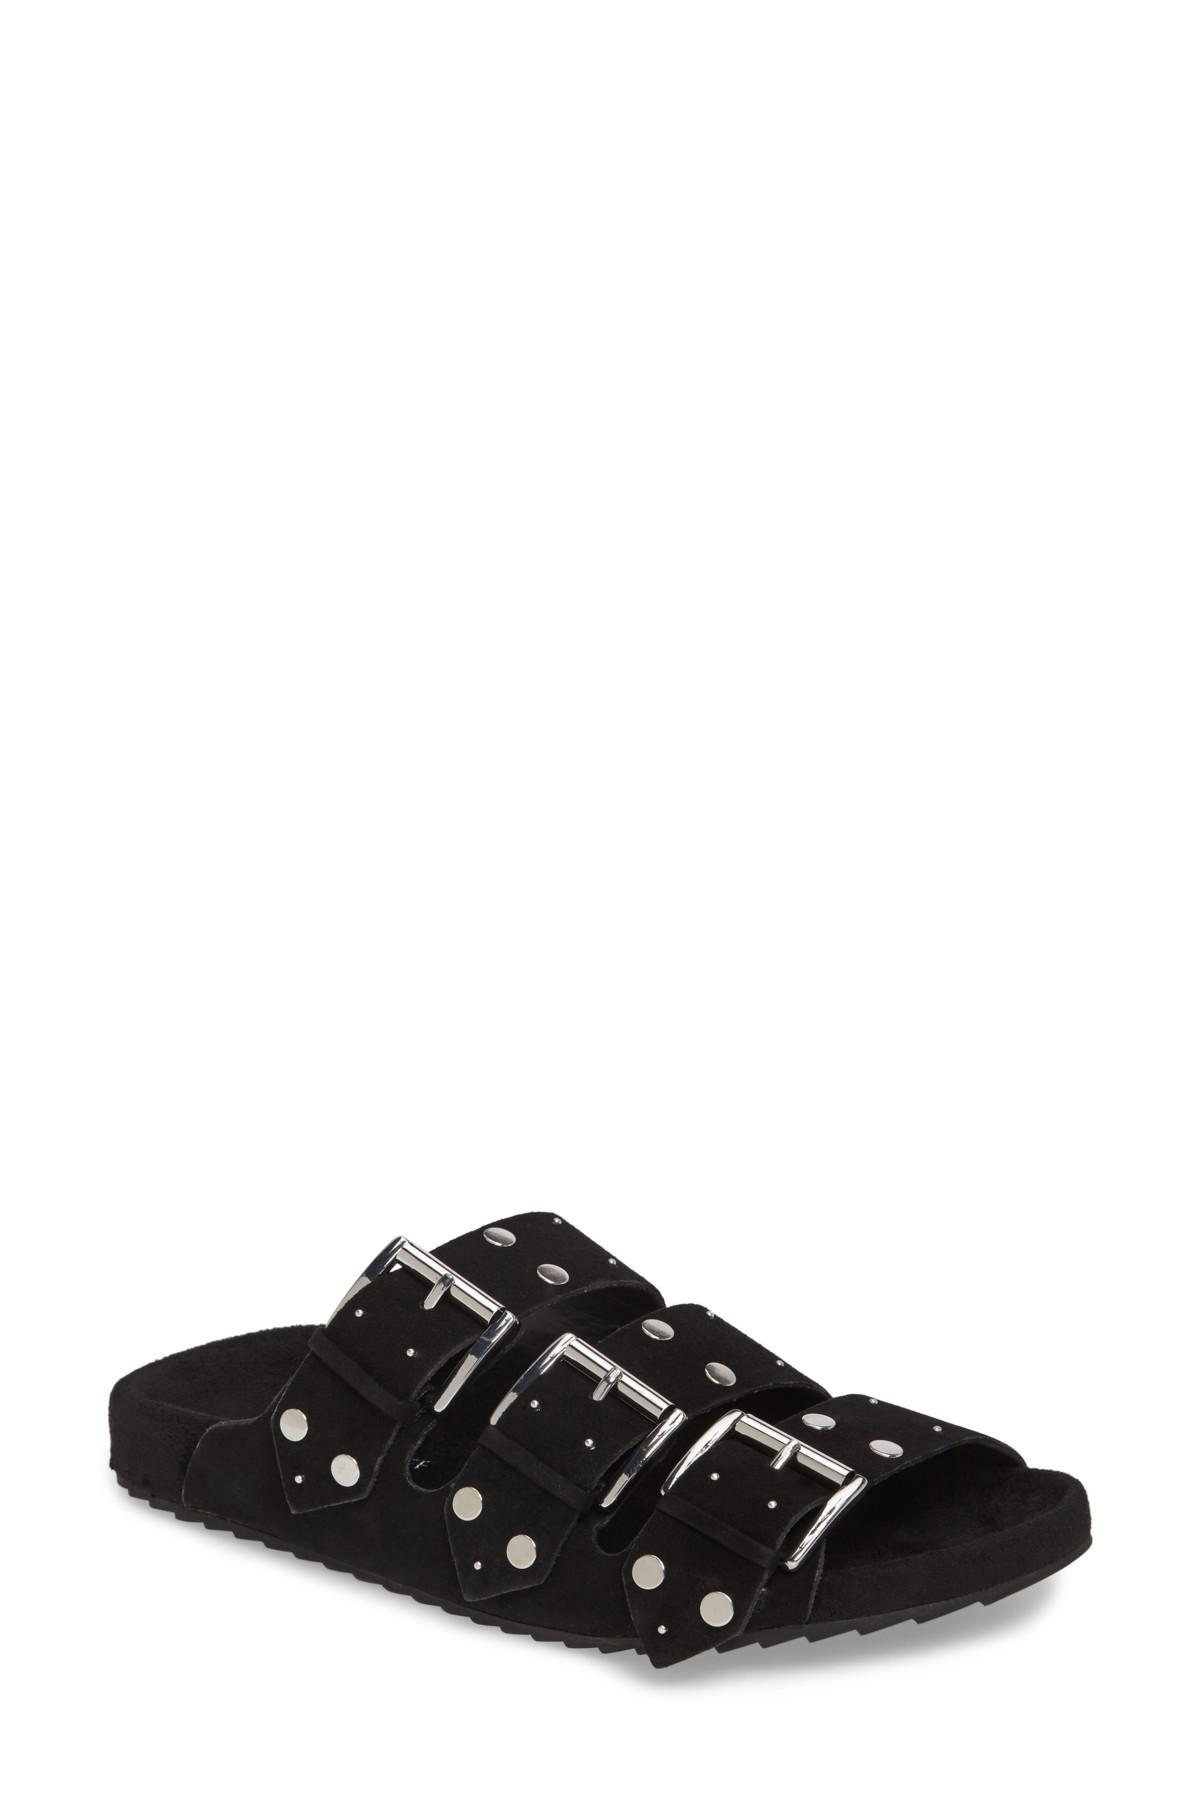 Femmes Rebecca Minkoff Tania Slide Chaussures VqOMEHC